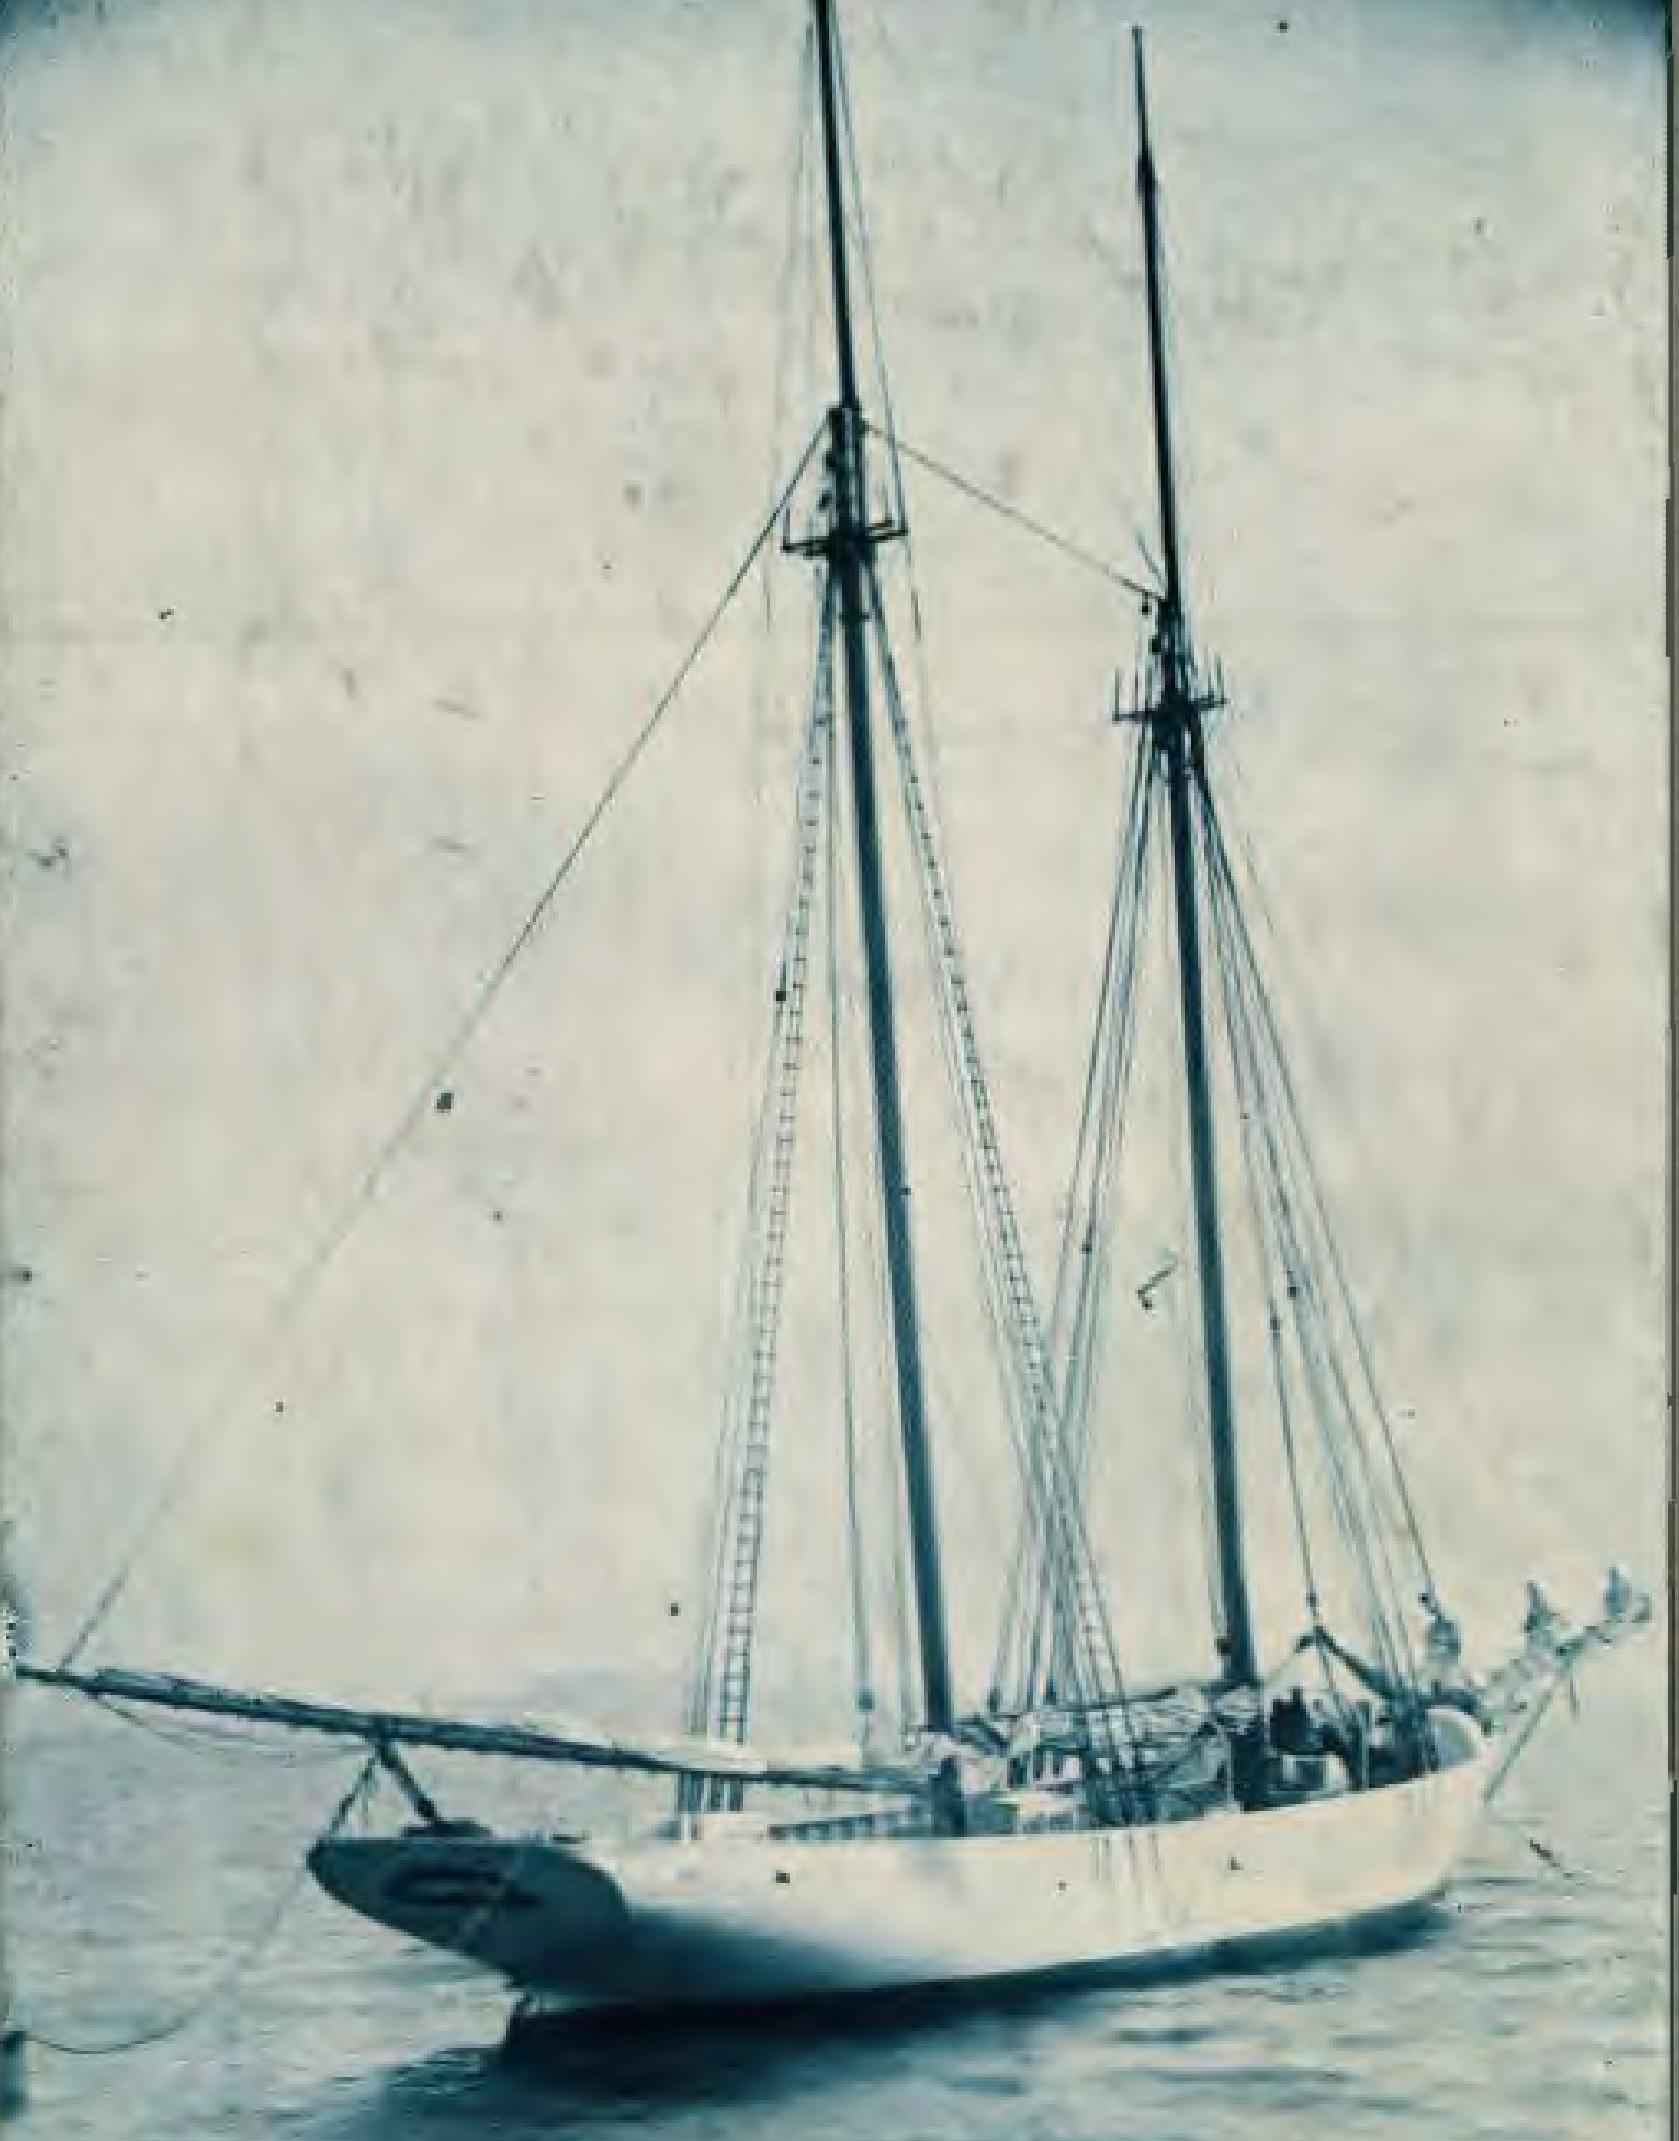 The Adventist schooner Pitcairn, circa 1890.